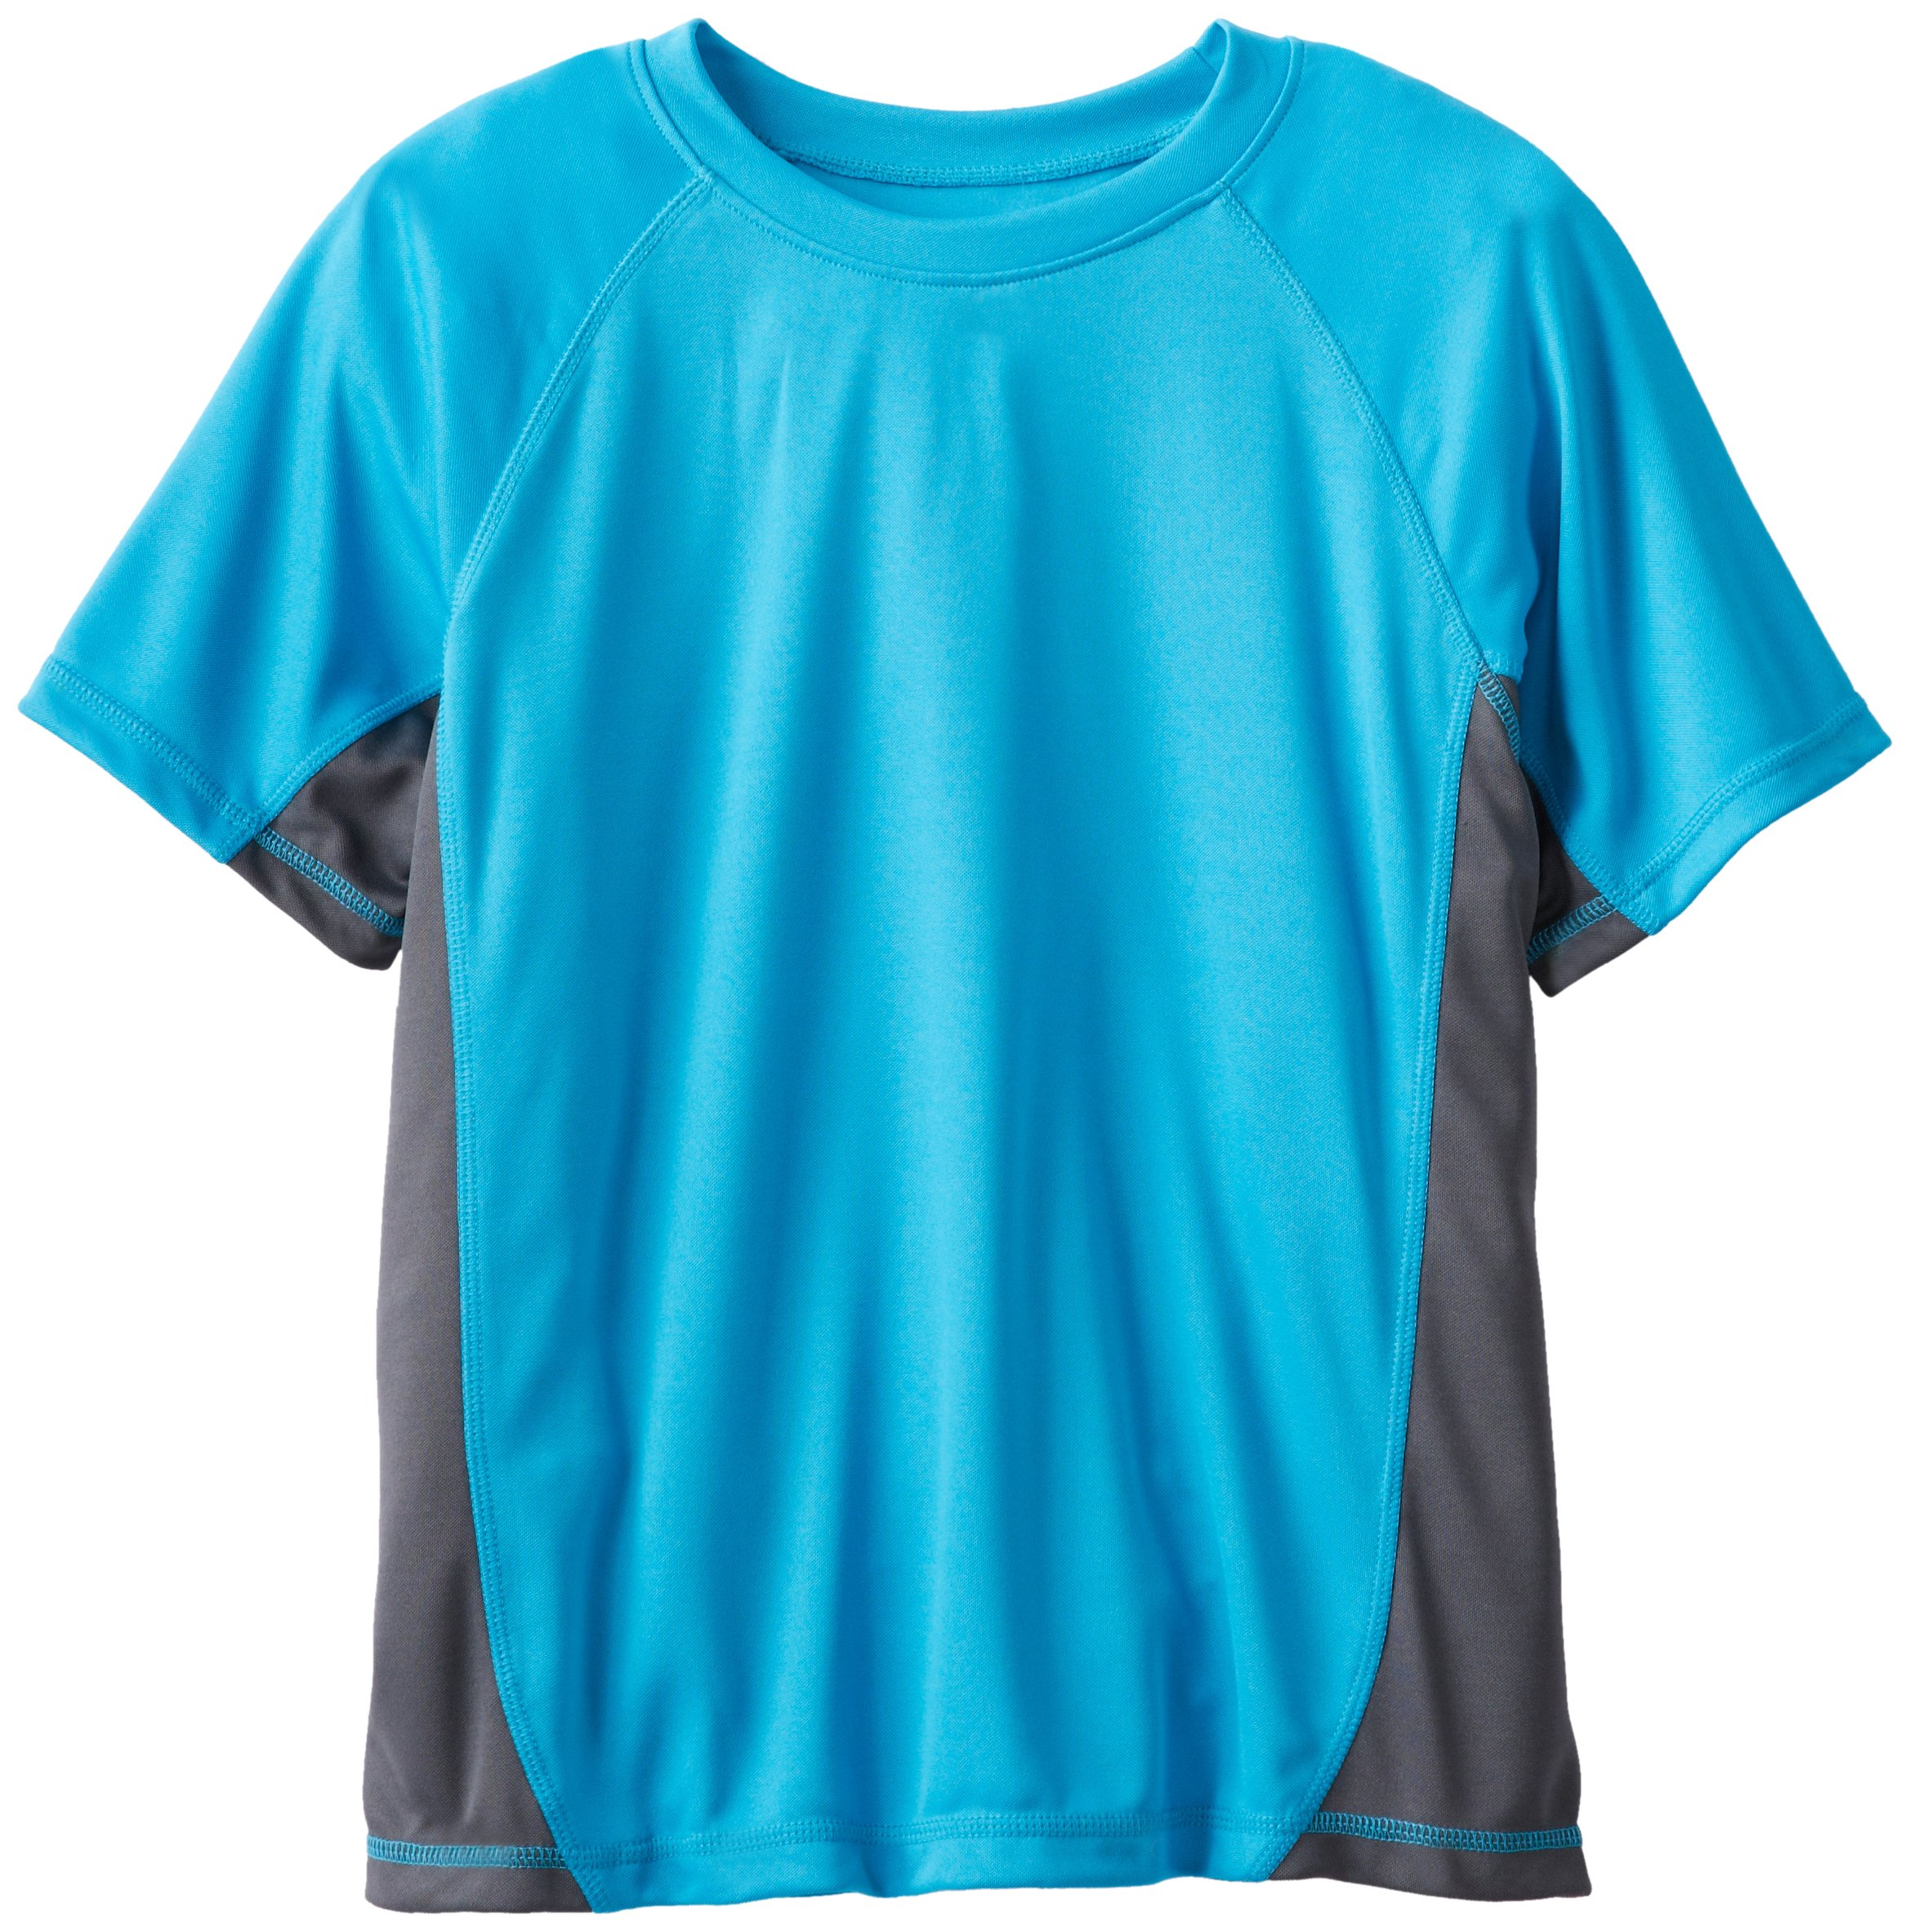 Kanu Surf Big Boys' CB Swim Shirt, Aqua, X-Large (14/16)